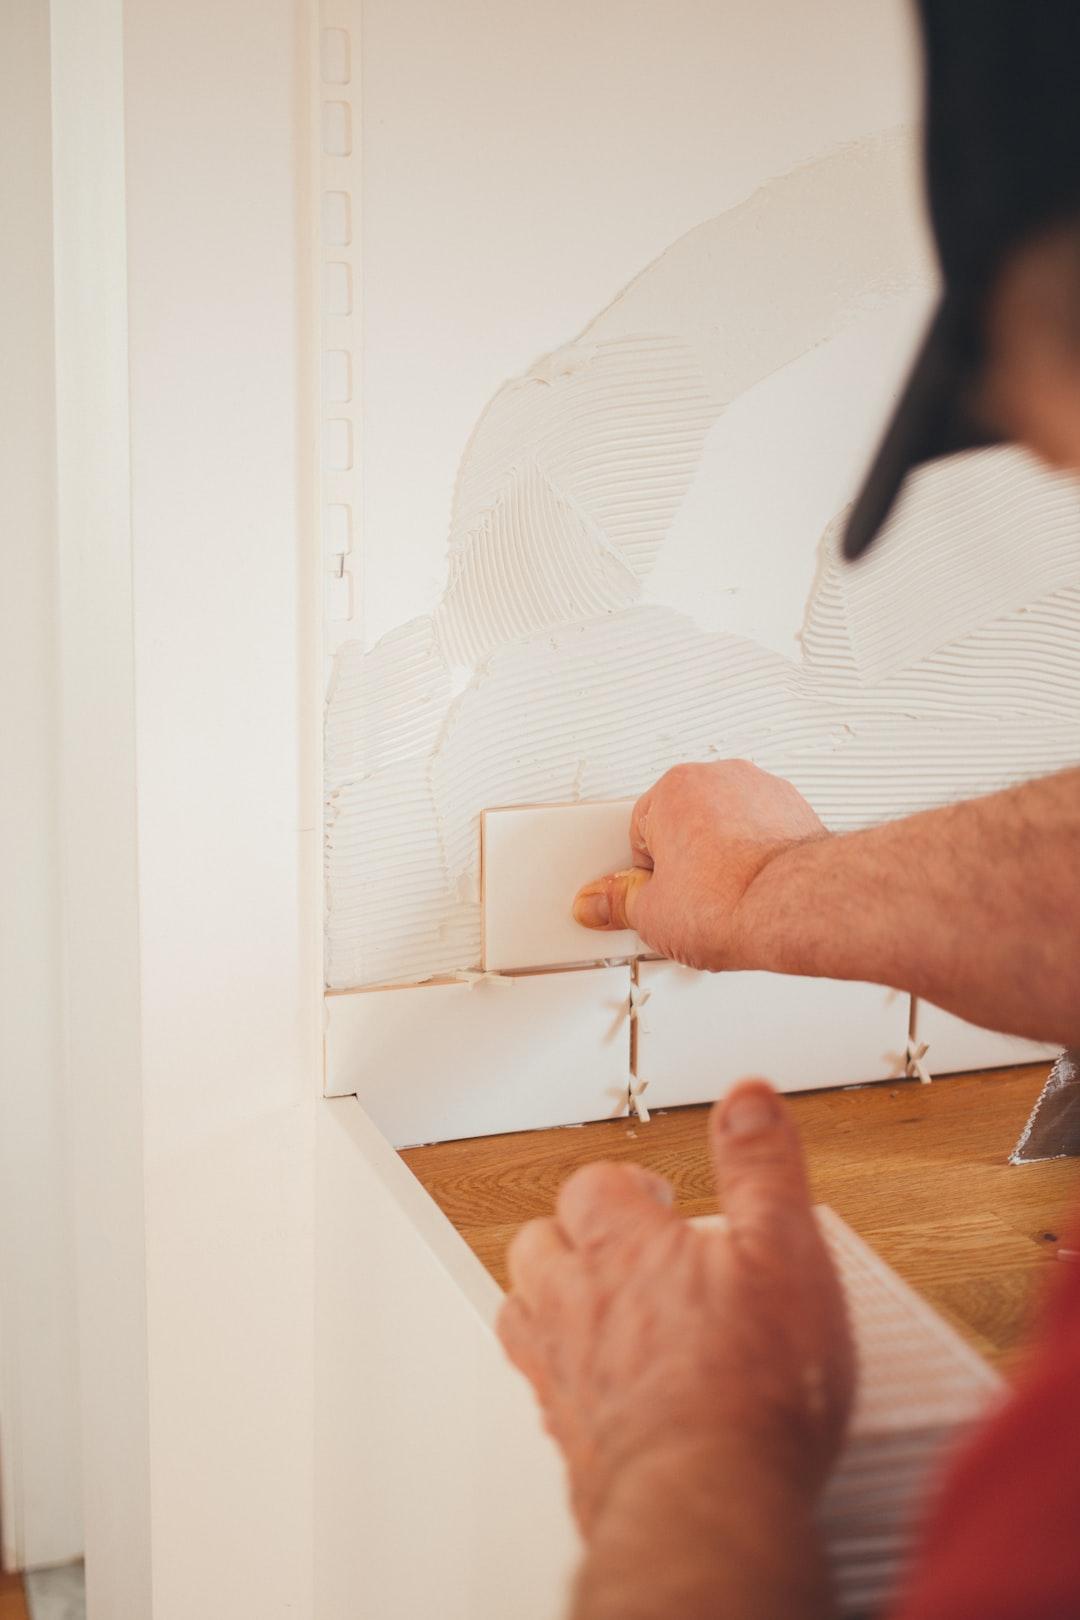 Documenting the process of tiling the kitchen backsplash.